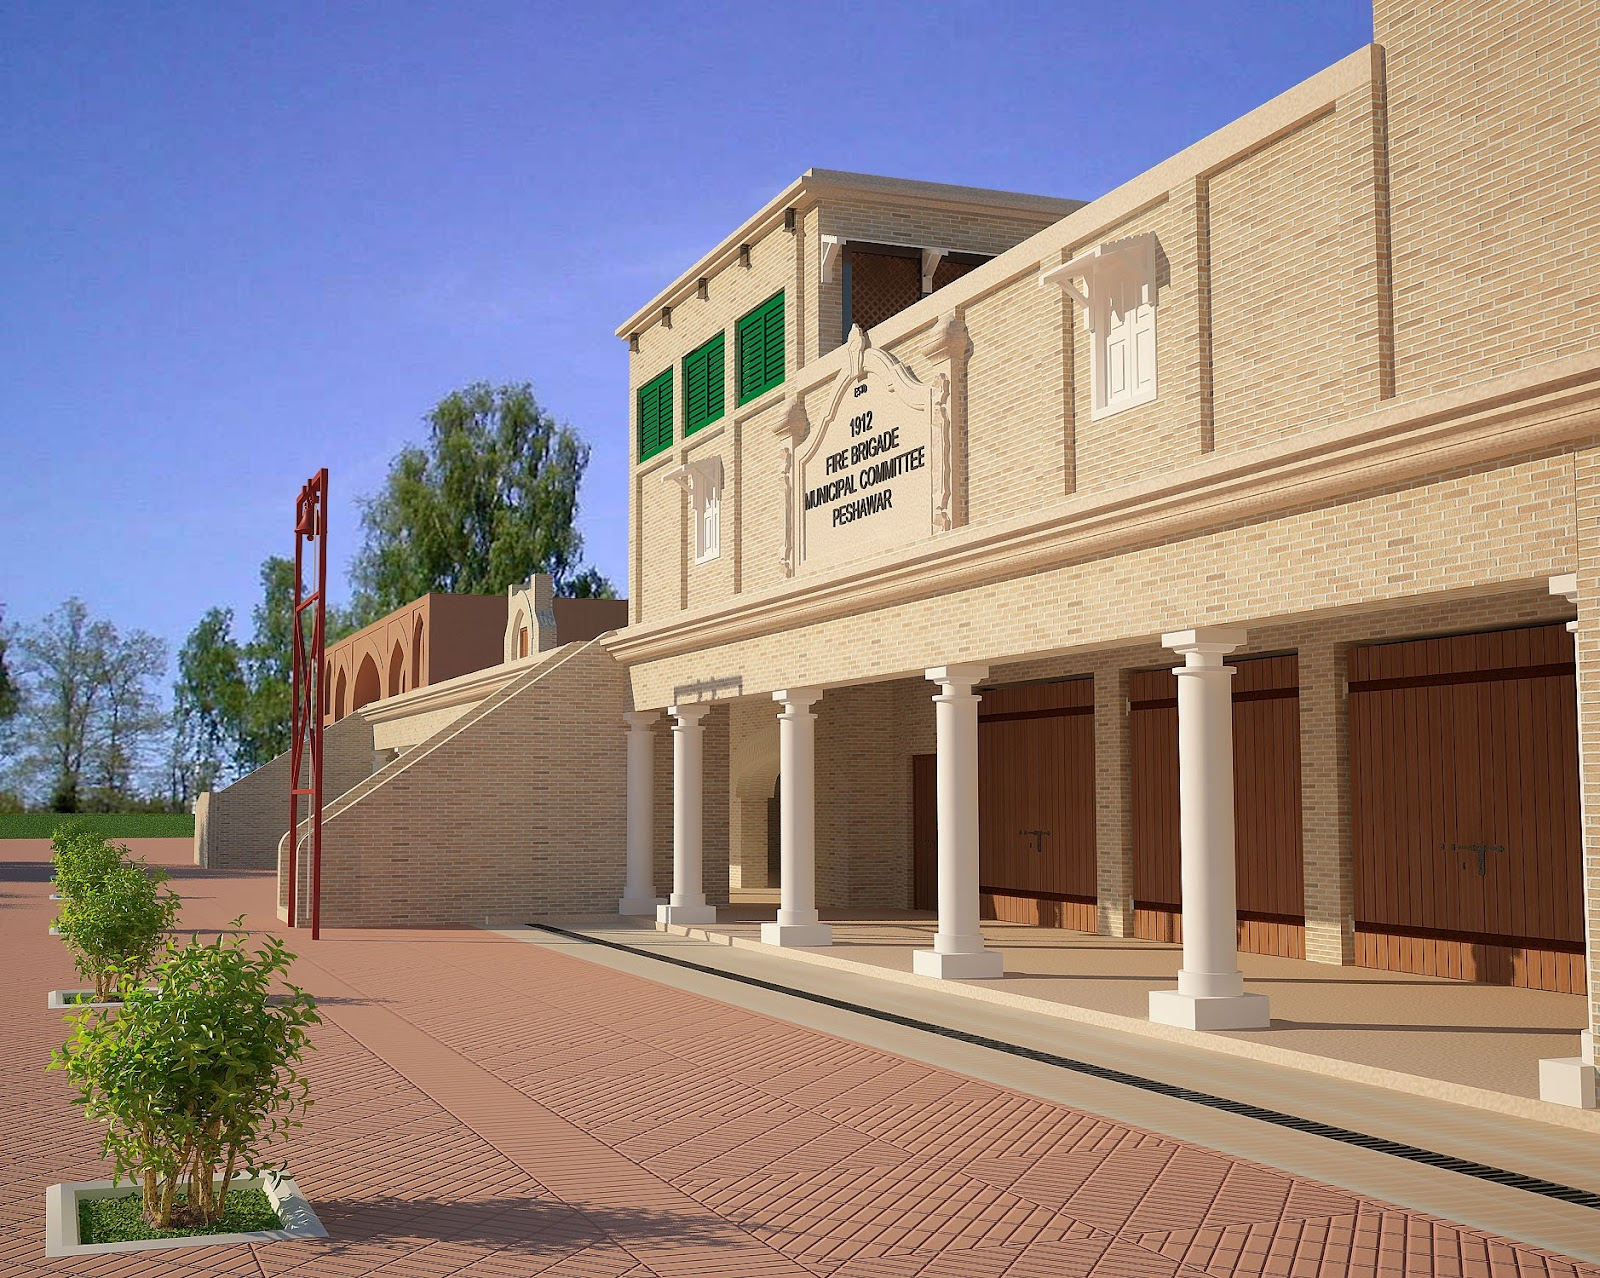 School Front Elevation Design : Marla house front elevation in pakistan joy studio